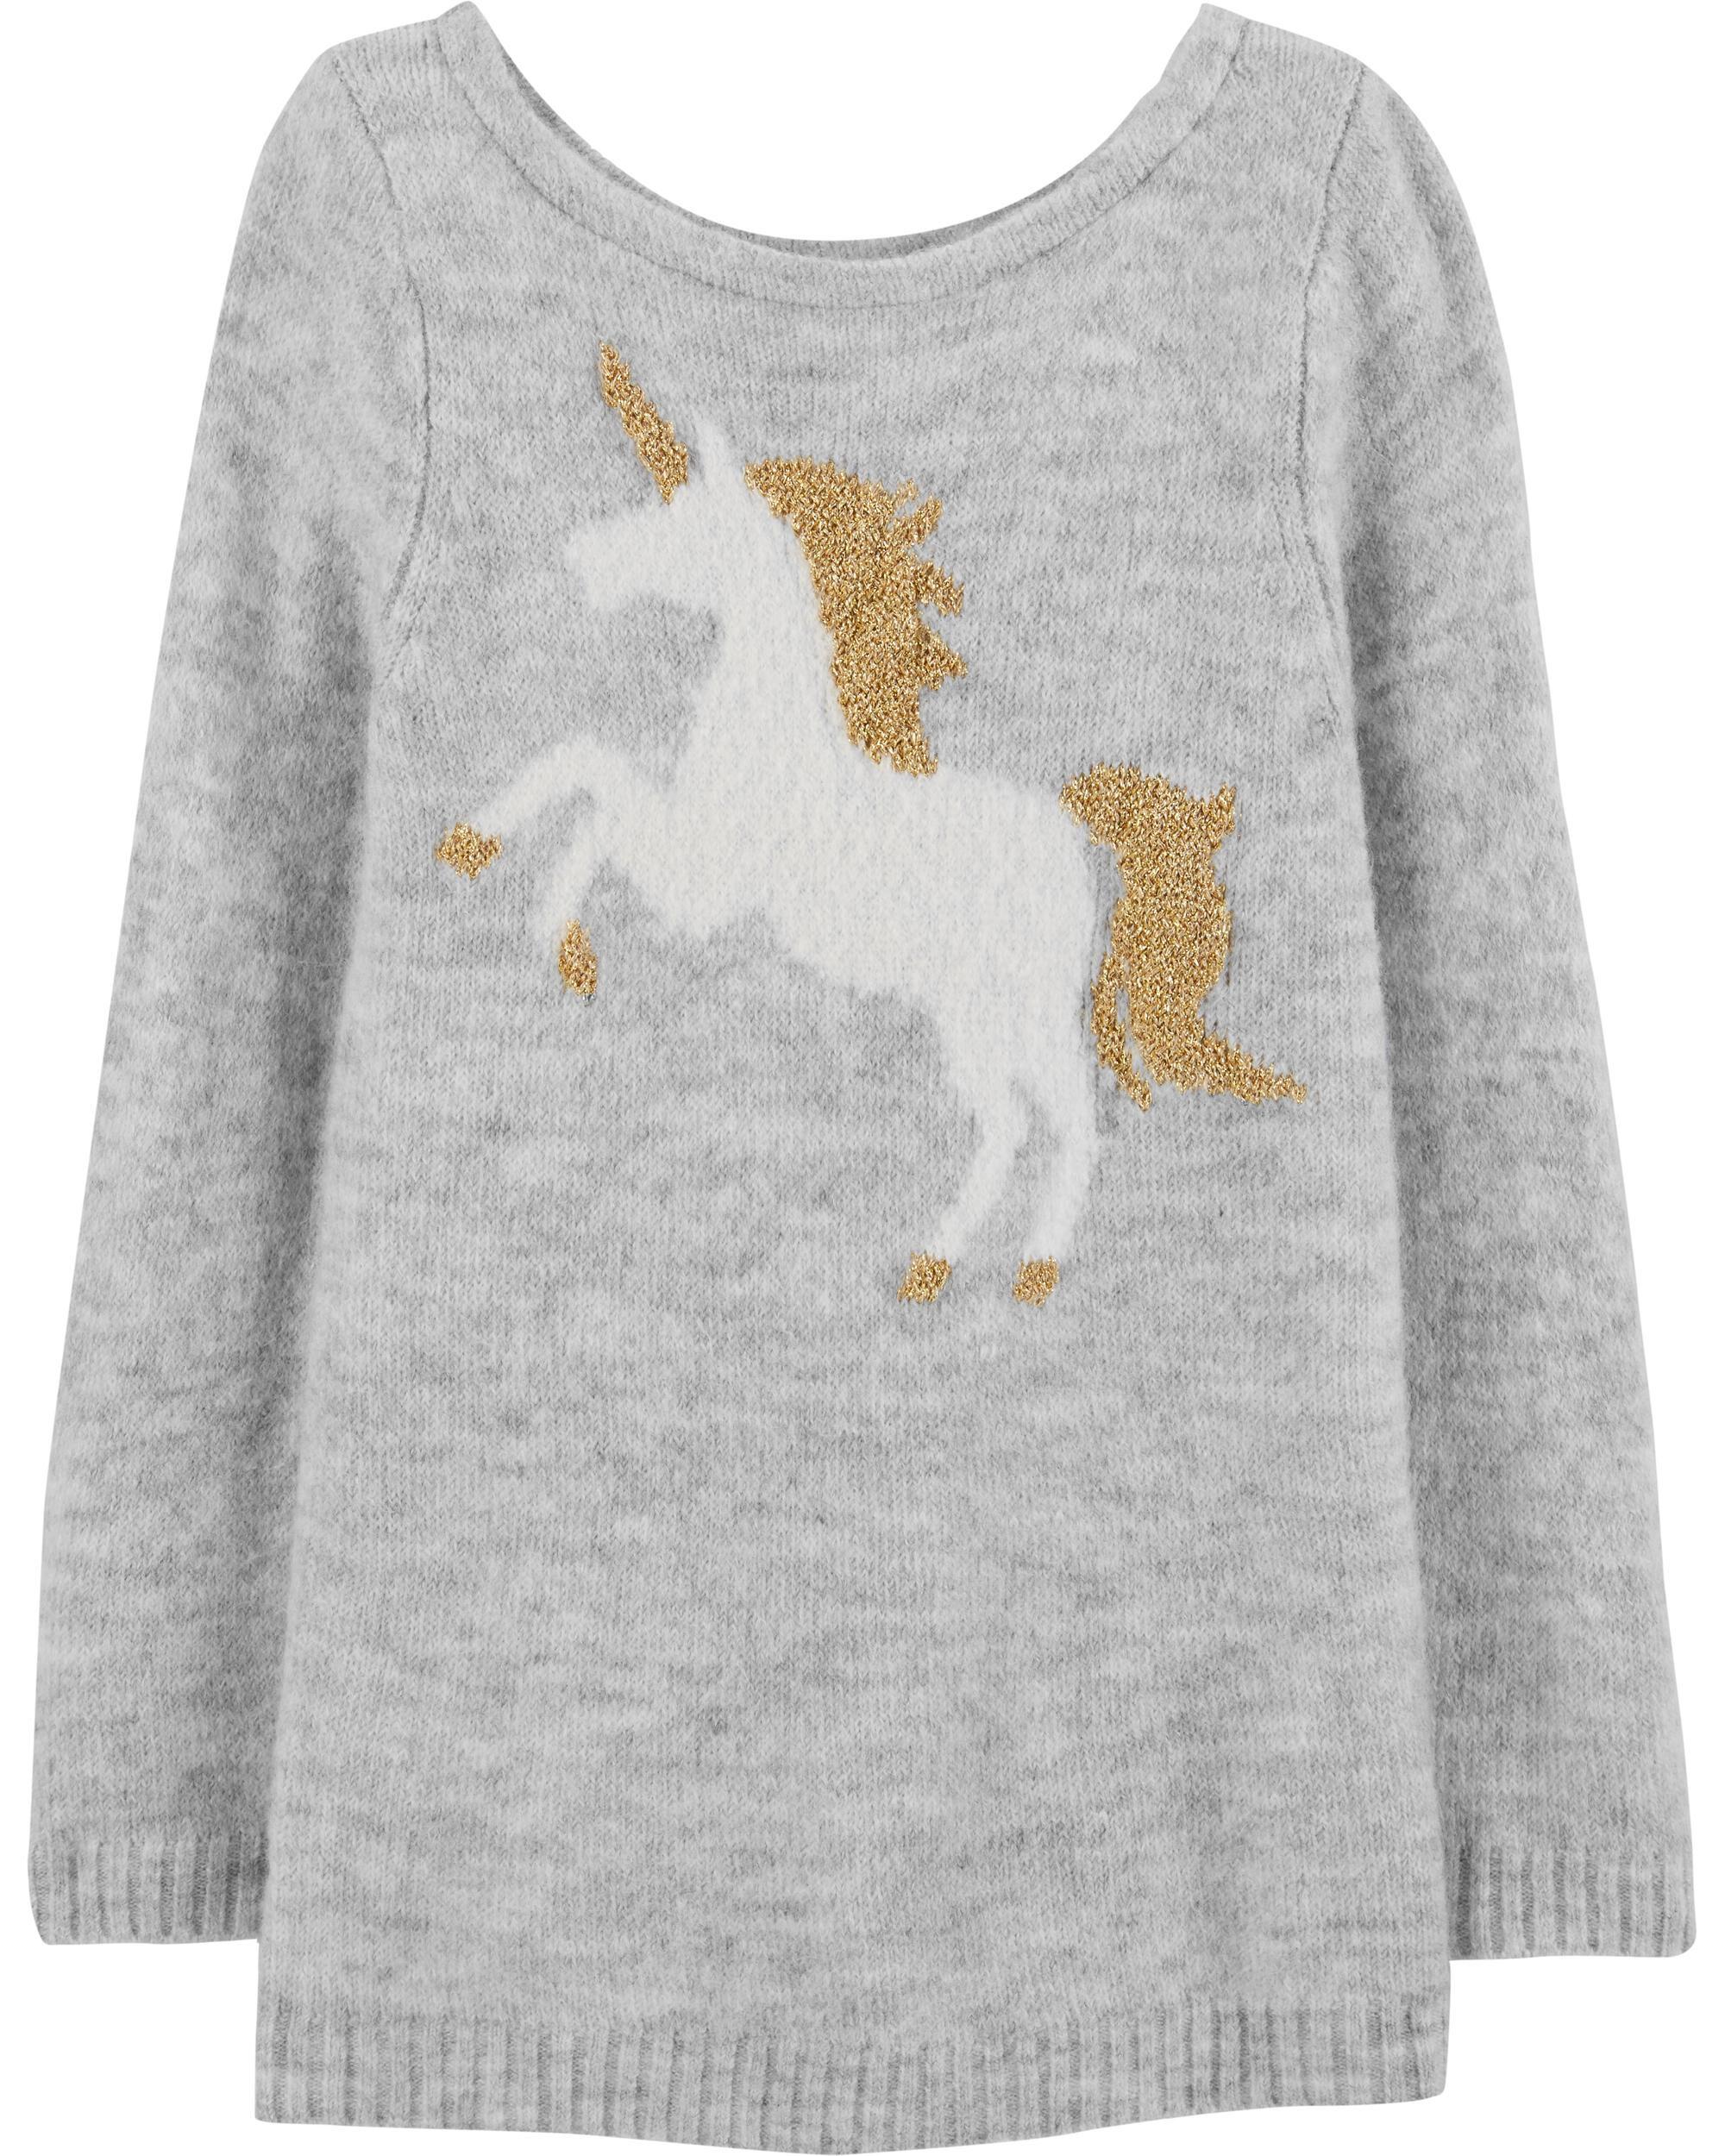 *Clearance*  Glitter Unicorn Sweater